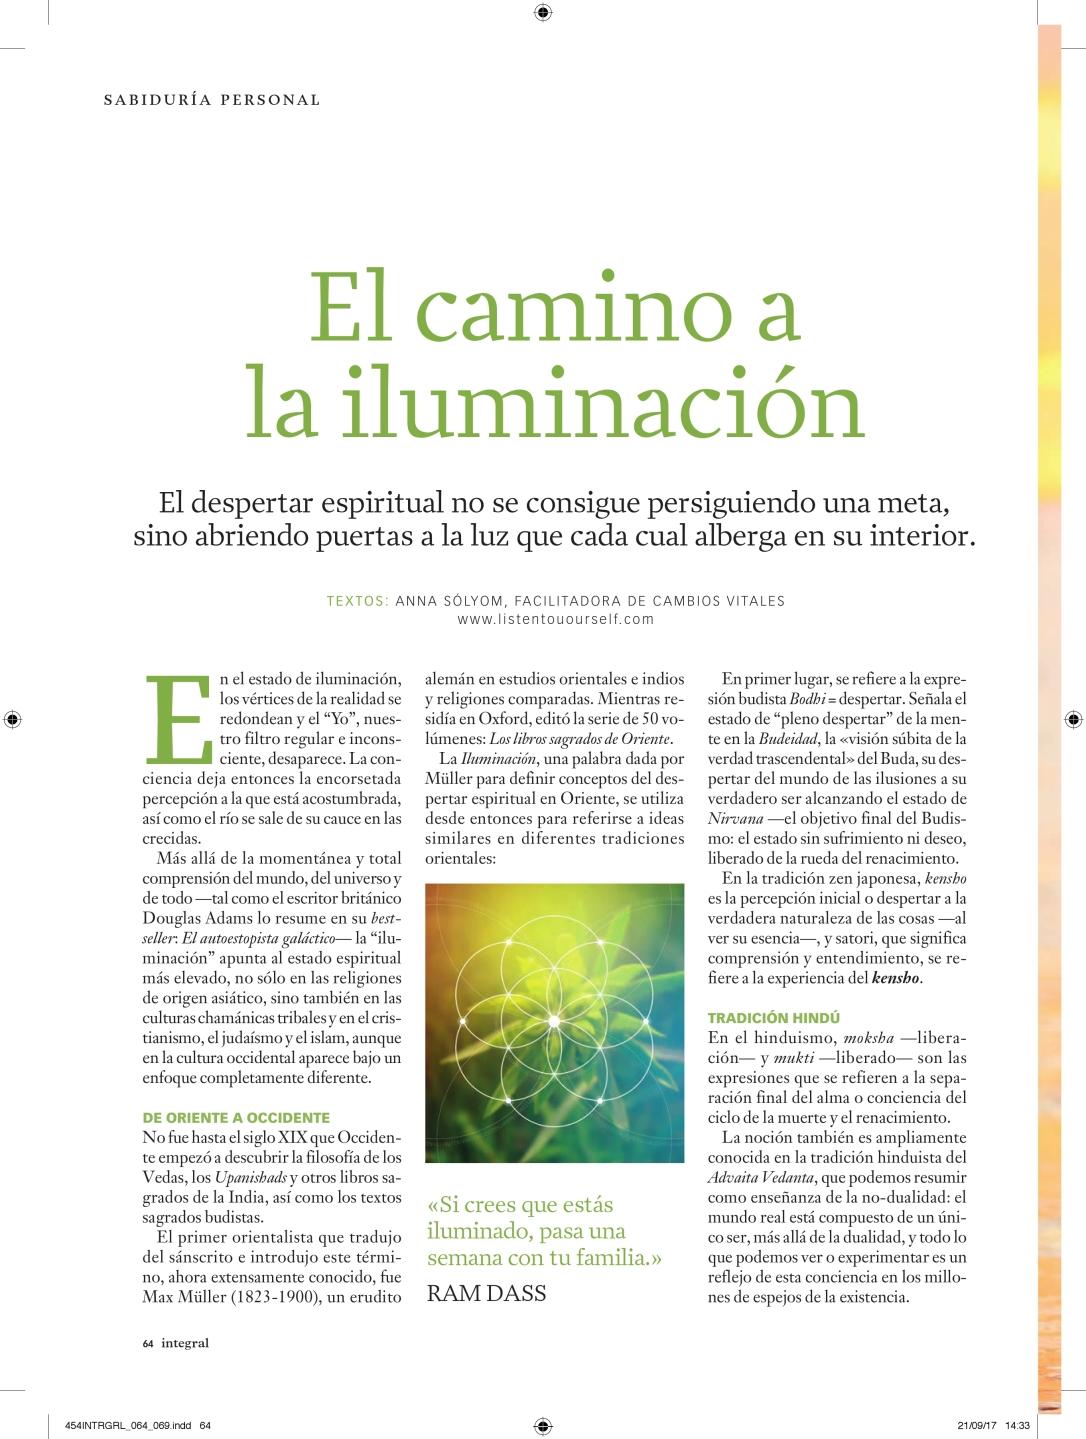 iluminacion_454INTRGRL_064_069_000001